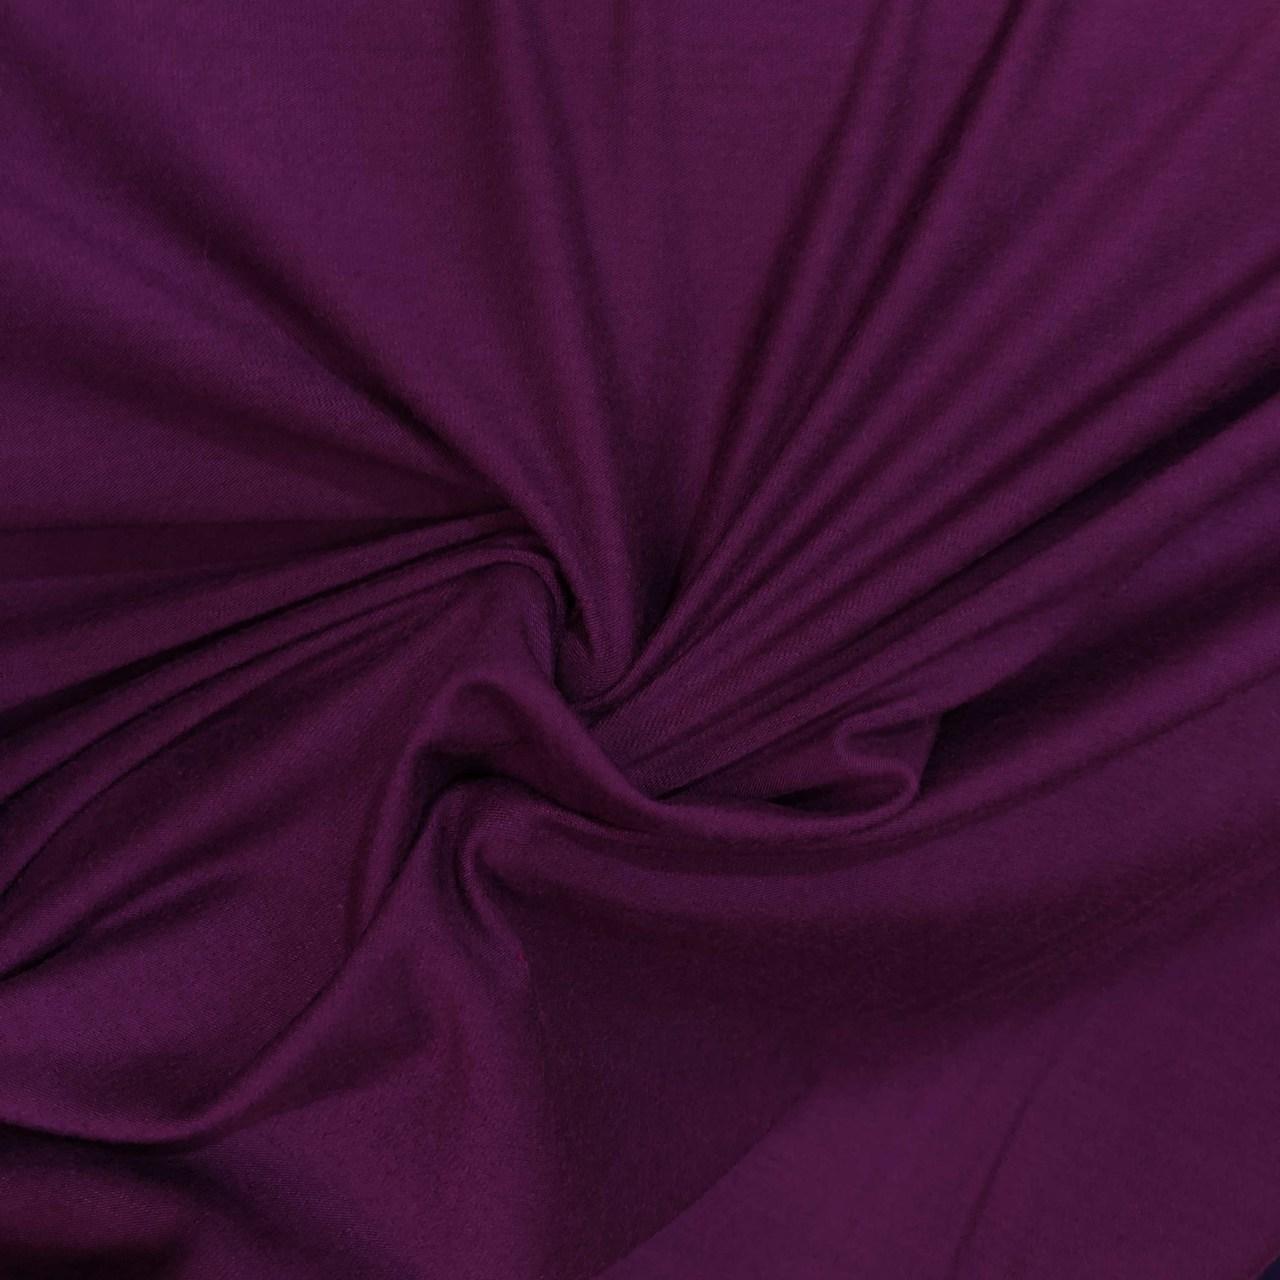 Tecido Malha Viscolycra  92%Viscose 8%Elastano Uva